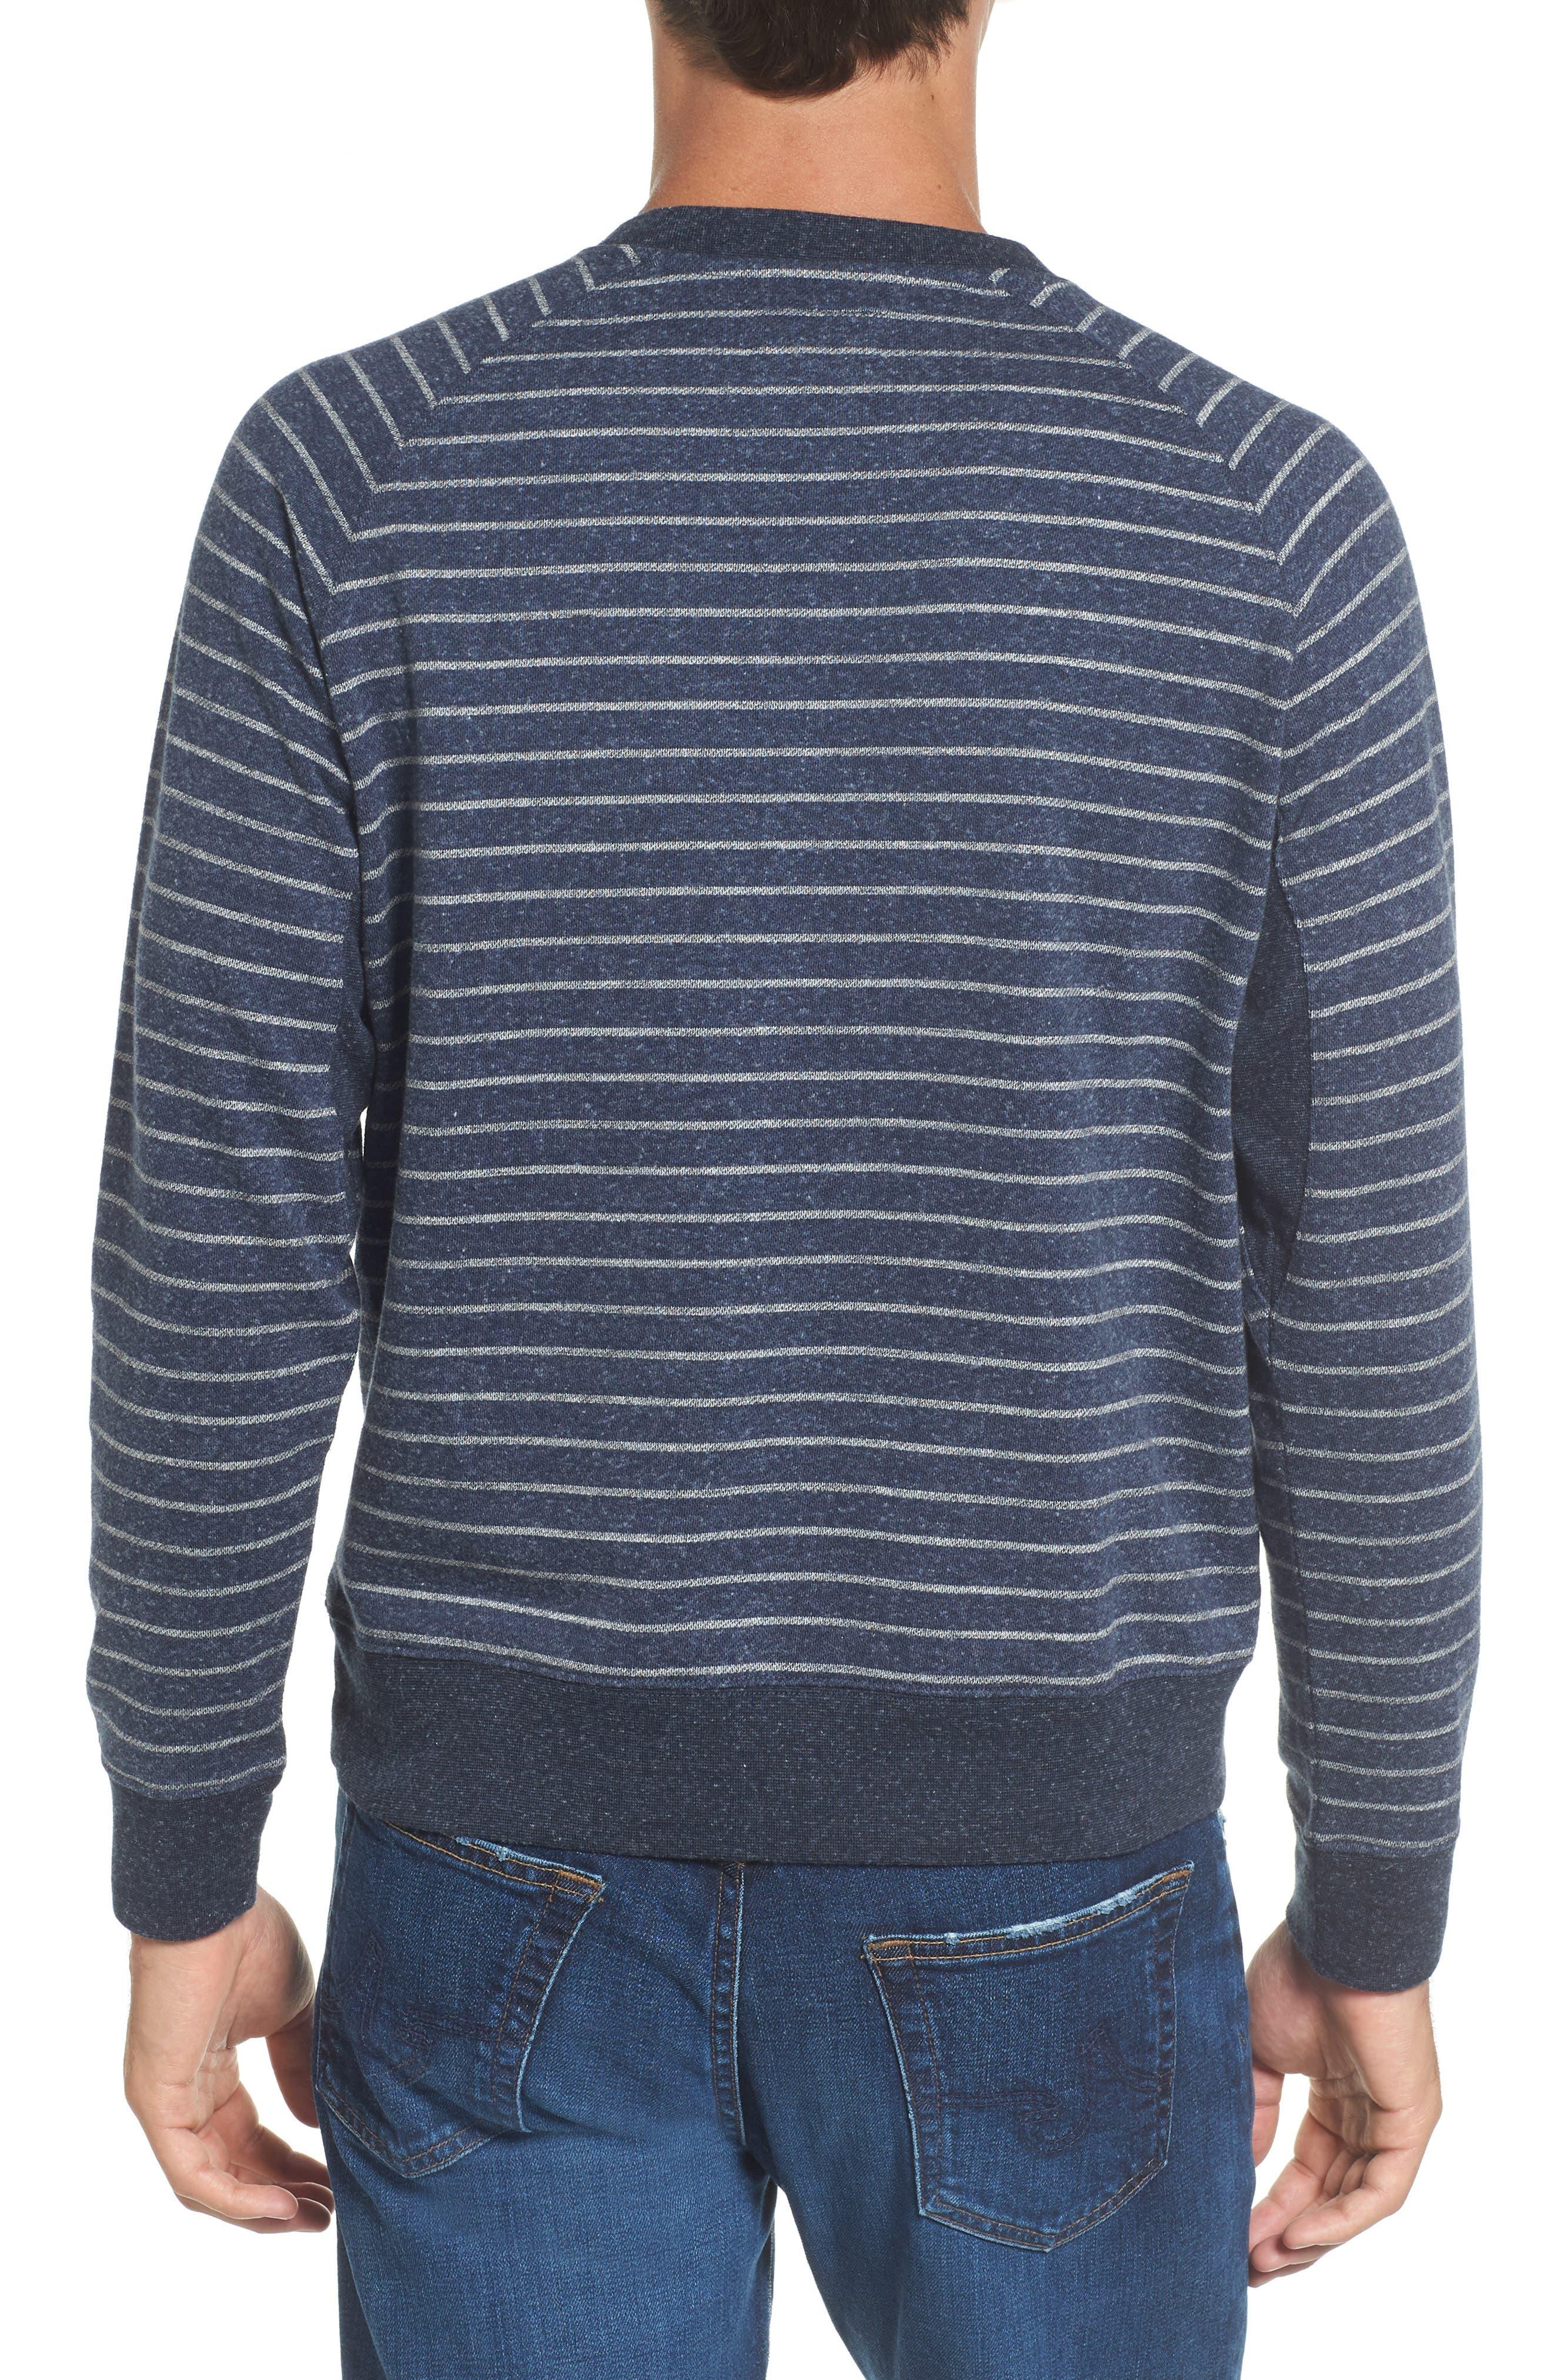 Palmer Modern Fit Athletic Stripe Sweatshirt,                             Alternate thumbnail 2, color,                             468